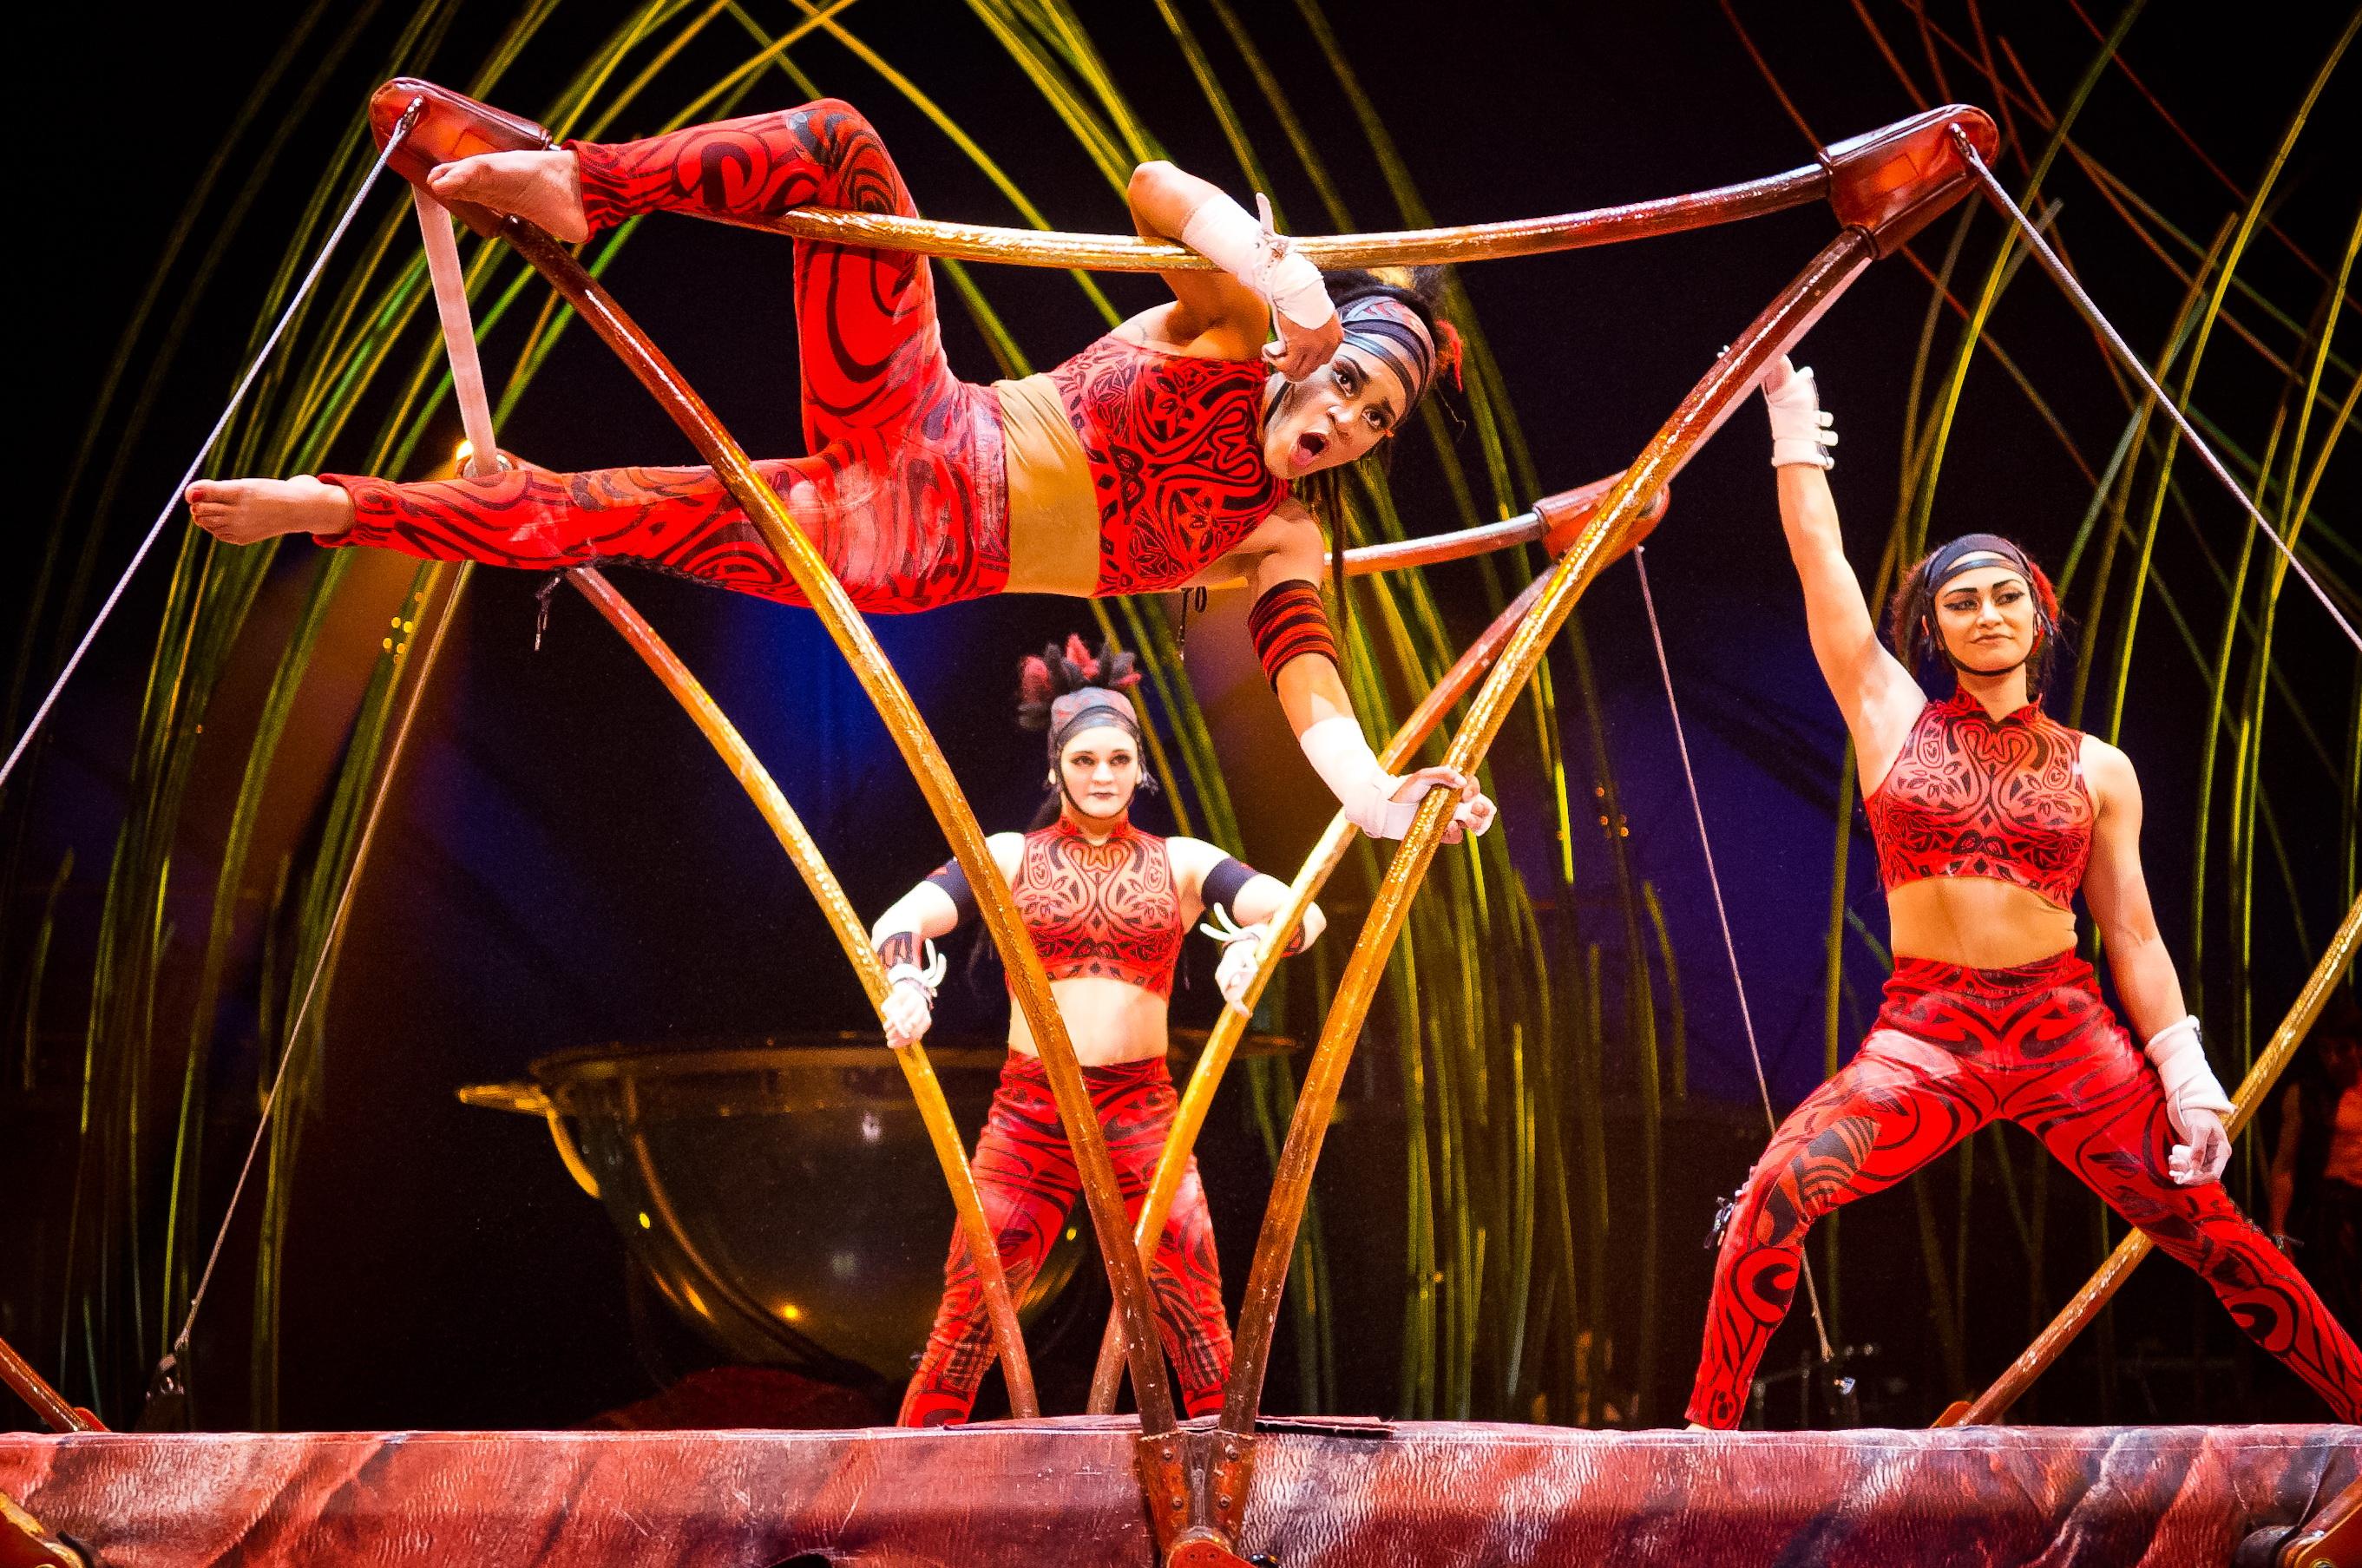 An update on Melanie Sinclair (front) the NCAA star, who's kicking ass as  an Amazon in Cirque du Soliel's Amaluna.